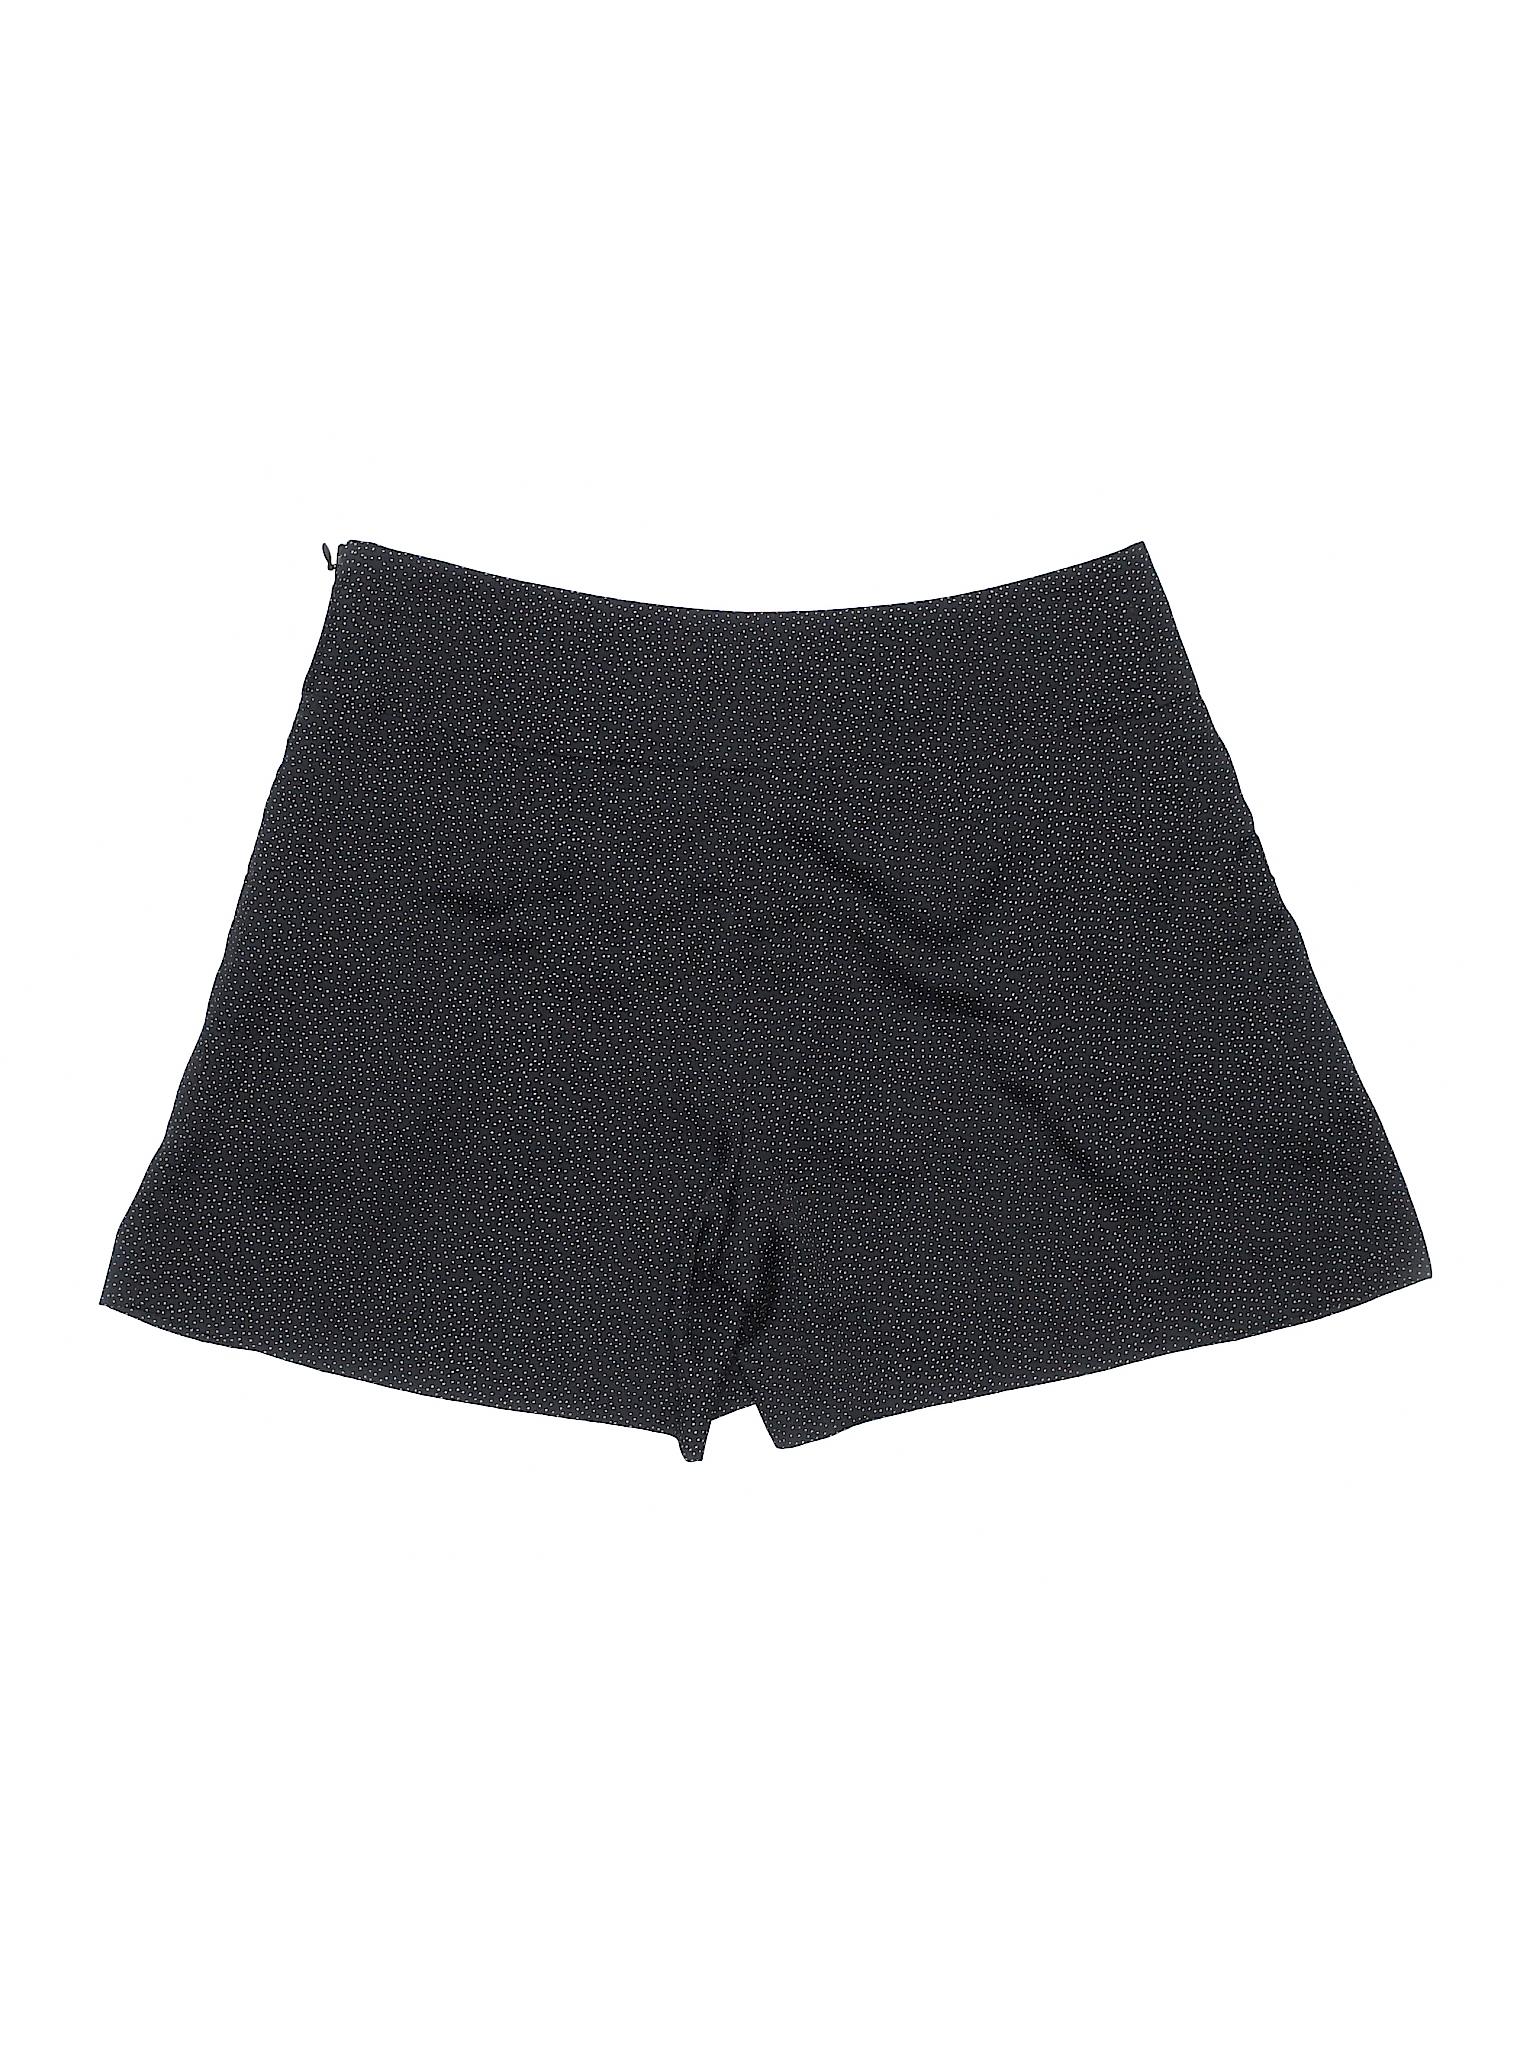 Taylor Ann Shorts Dressy LOFT Boutique qwaUF5X